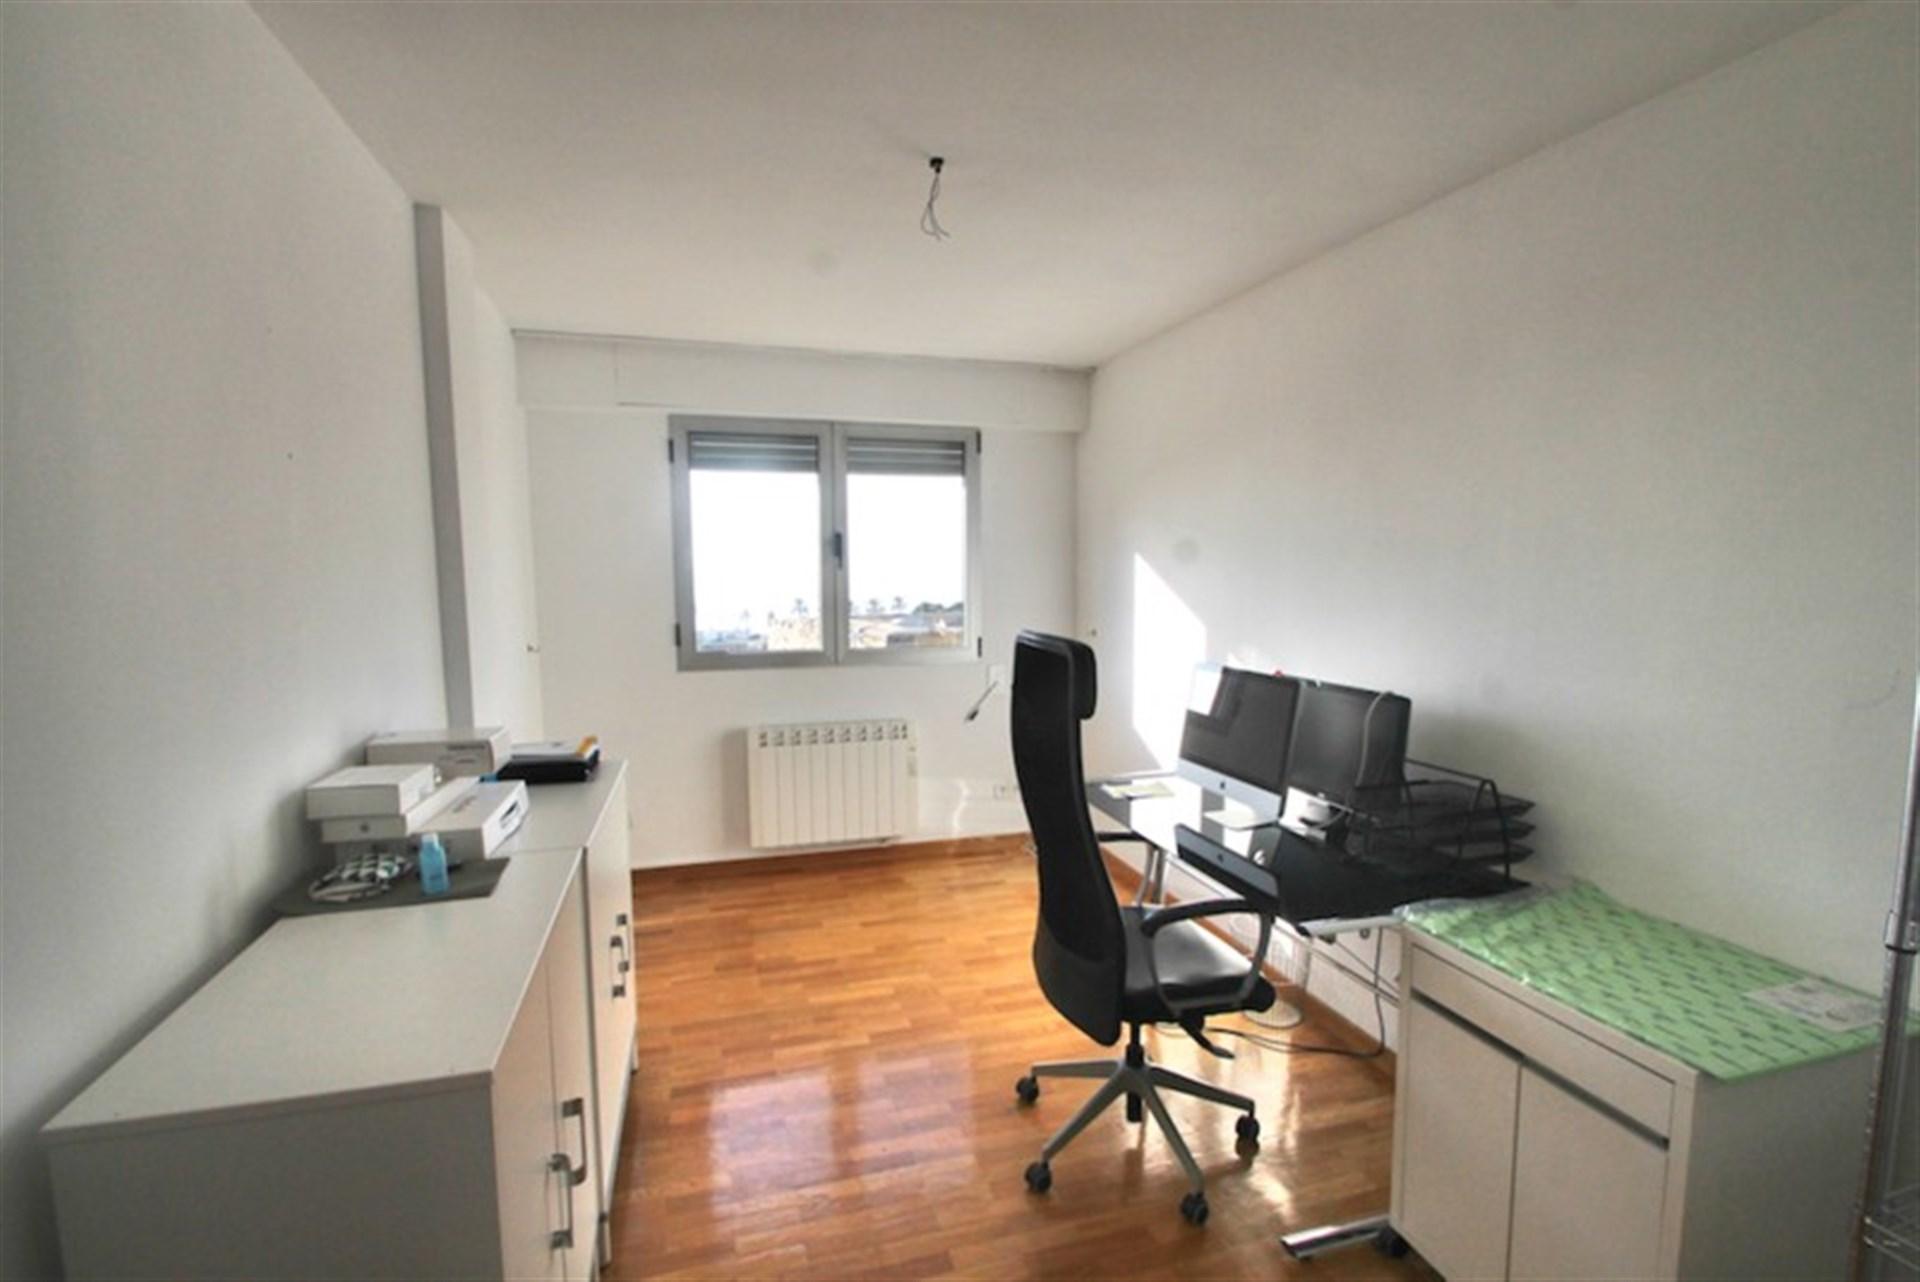 Sovrum/kontor 2